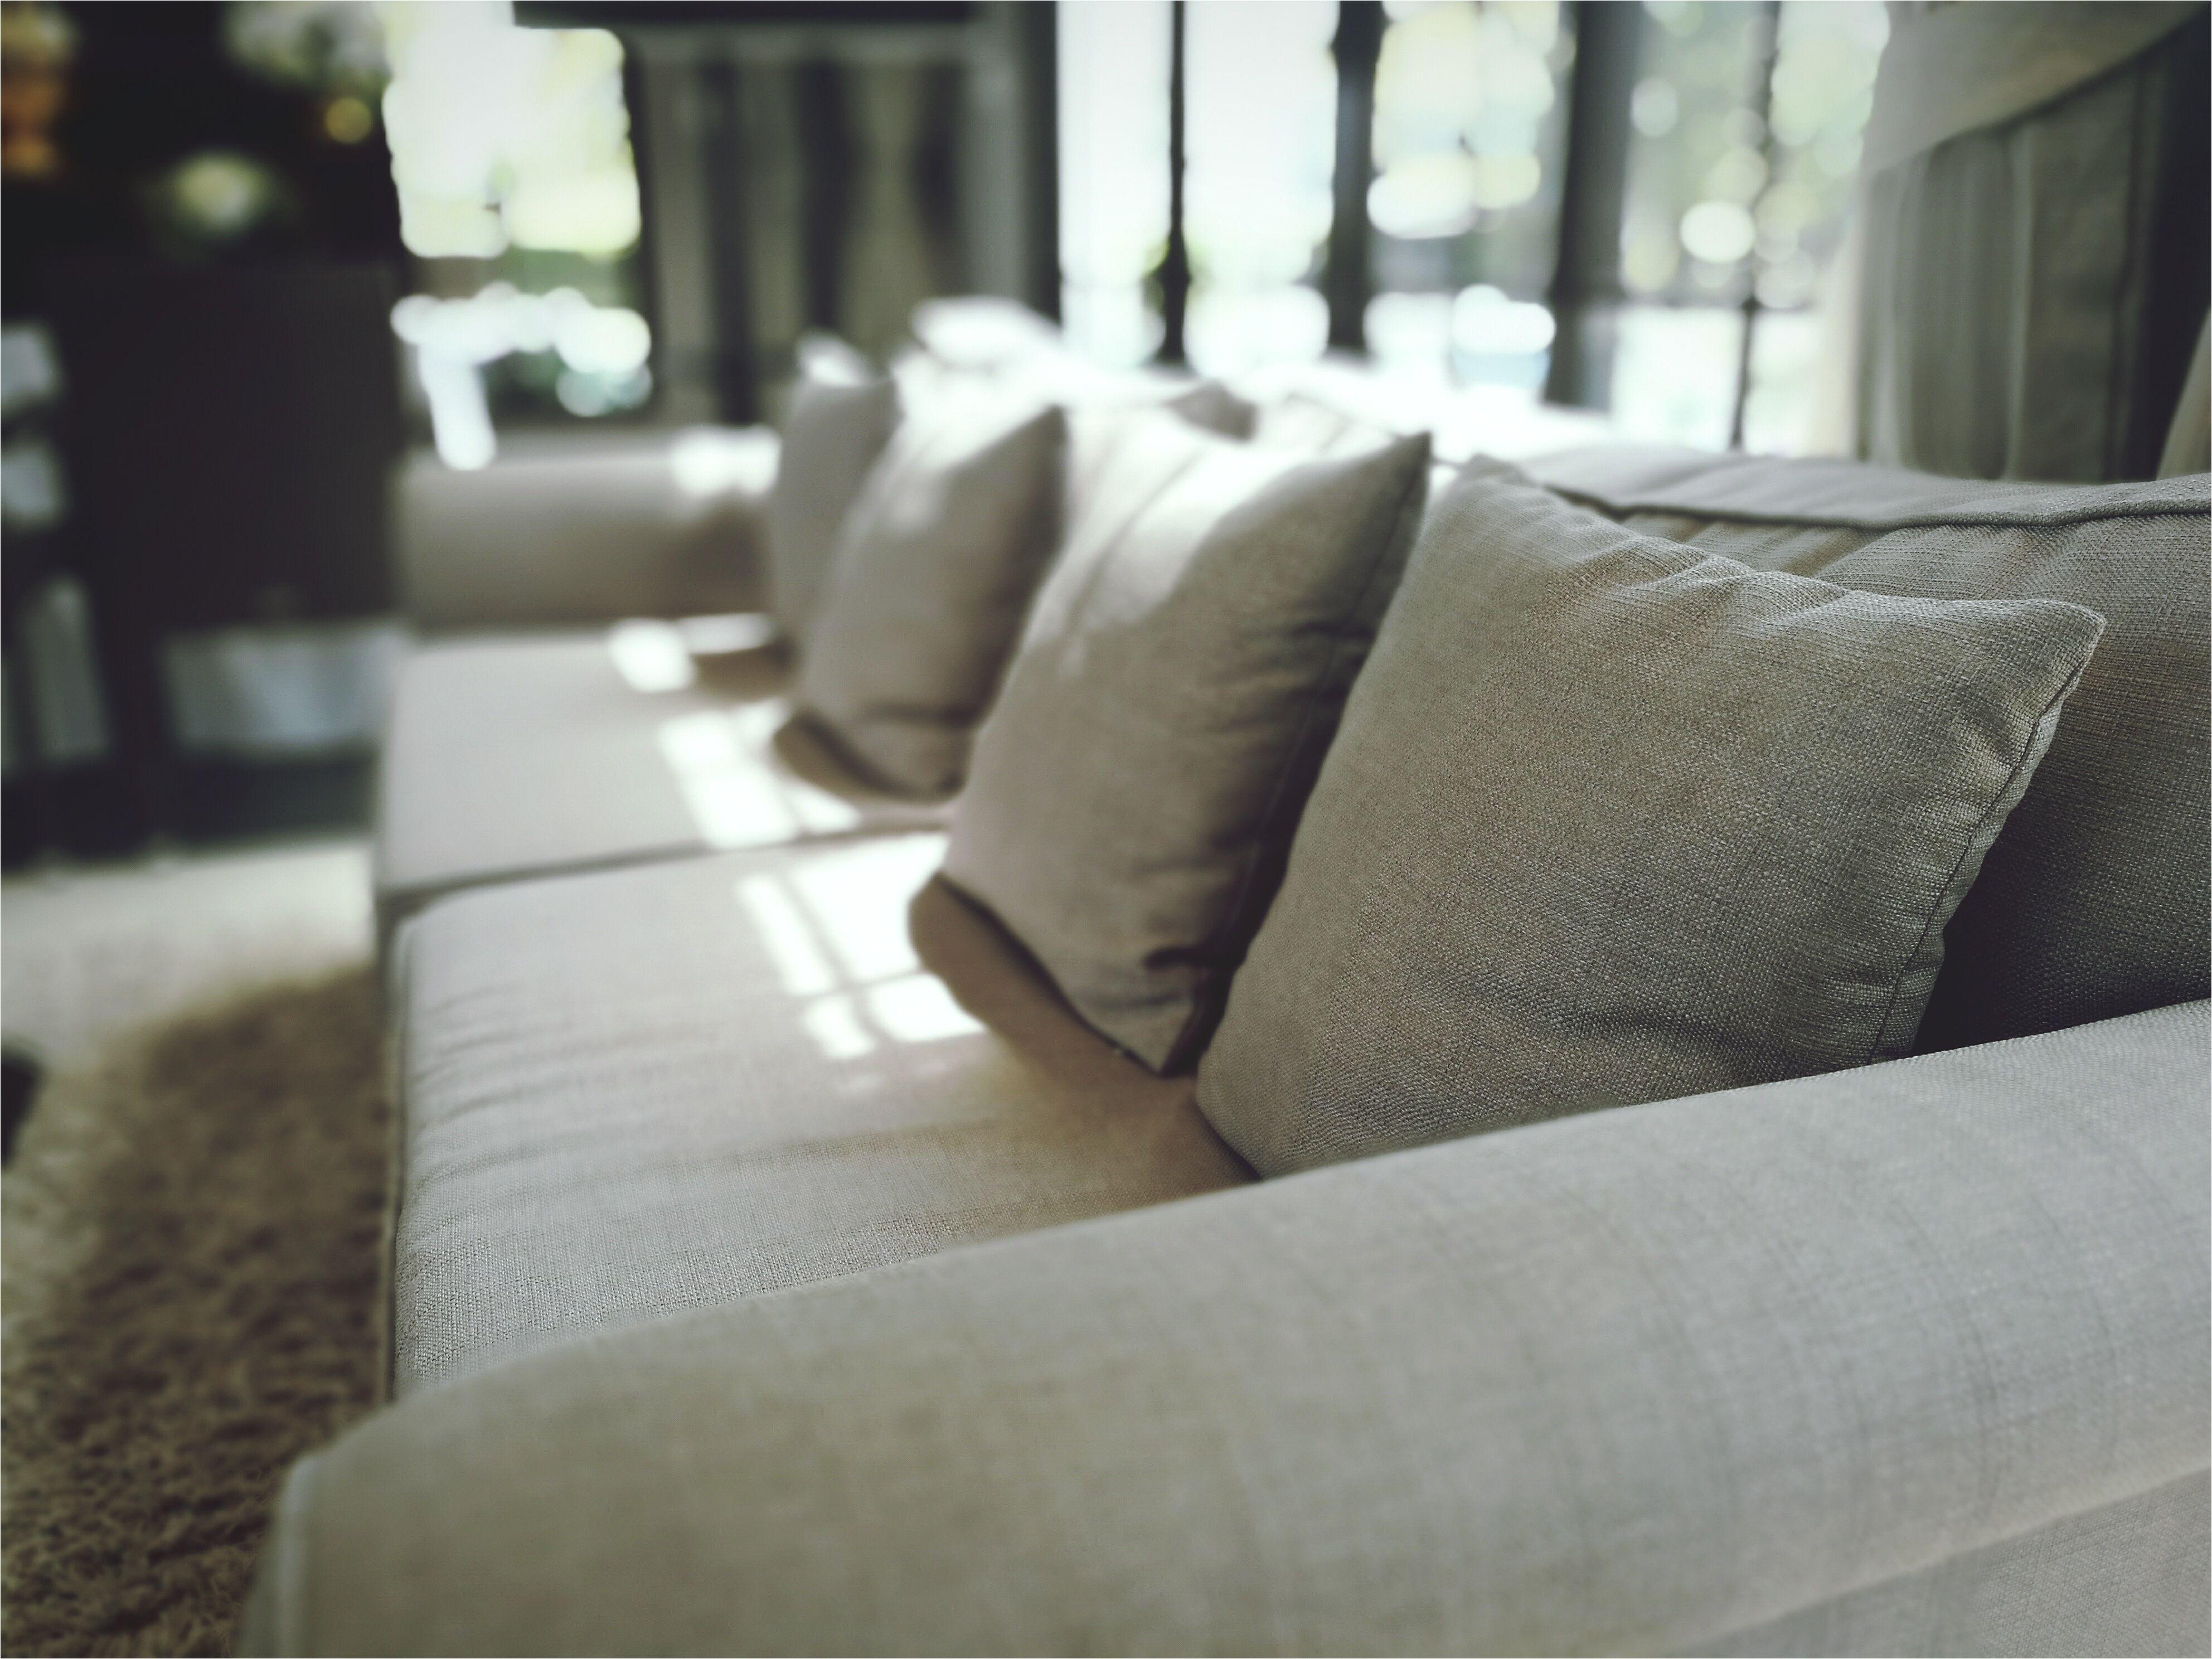 close up of sofa at home 763281387 5c47cbc9c9e77c000191f7d7 jpg